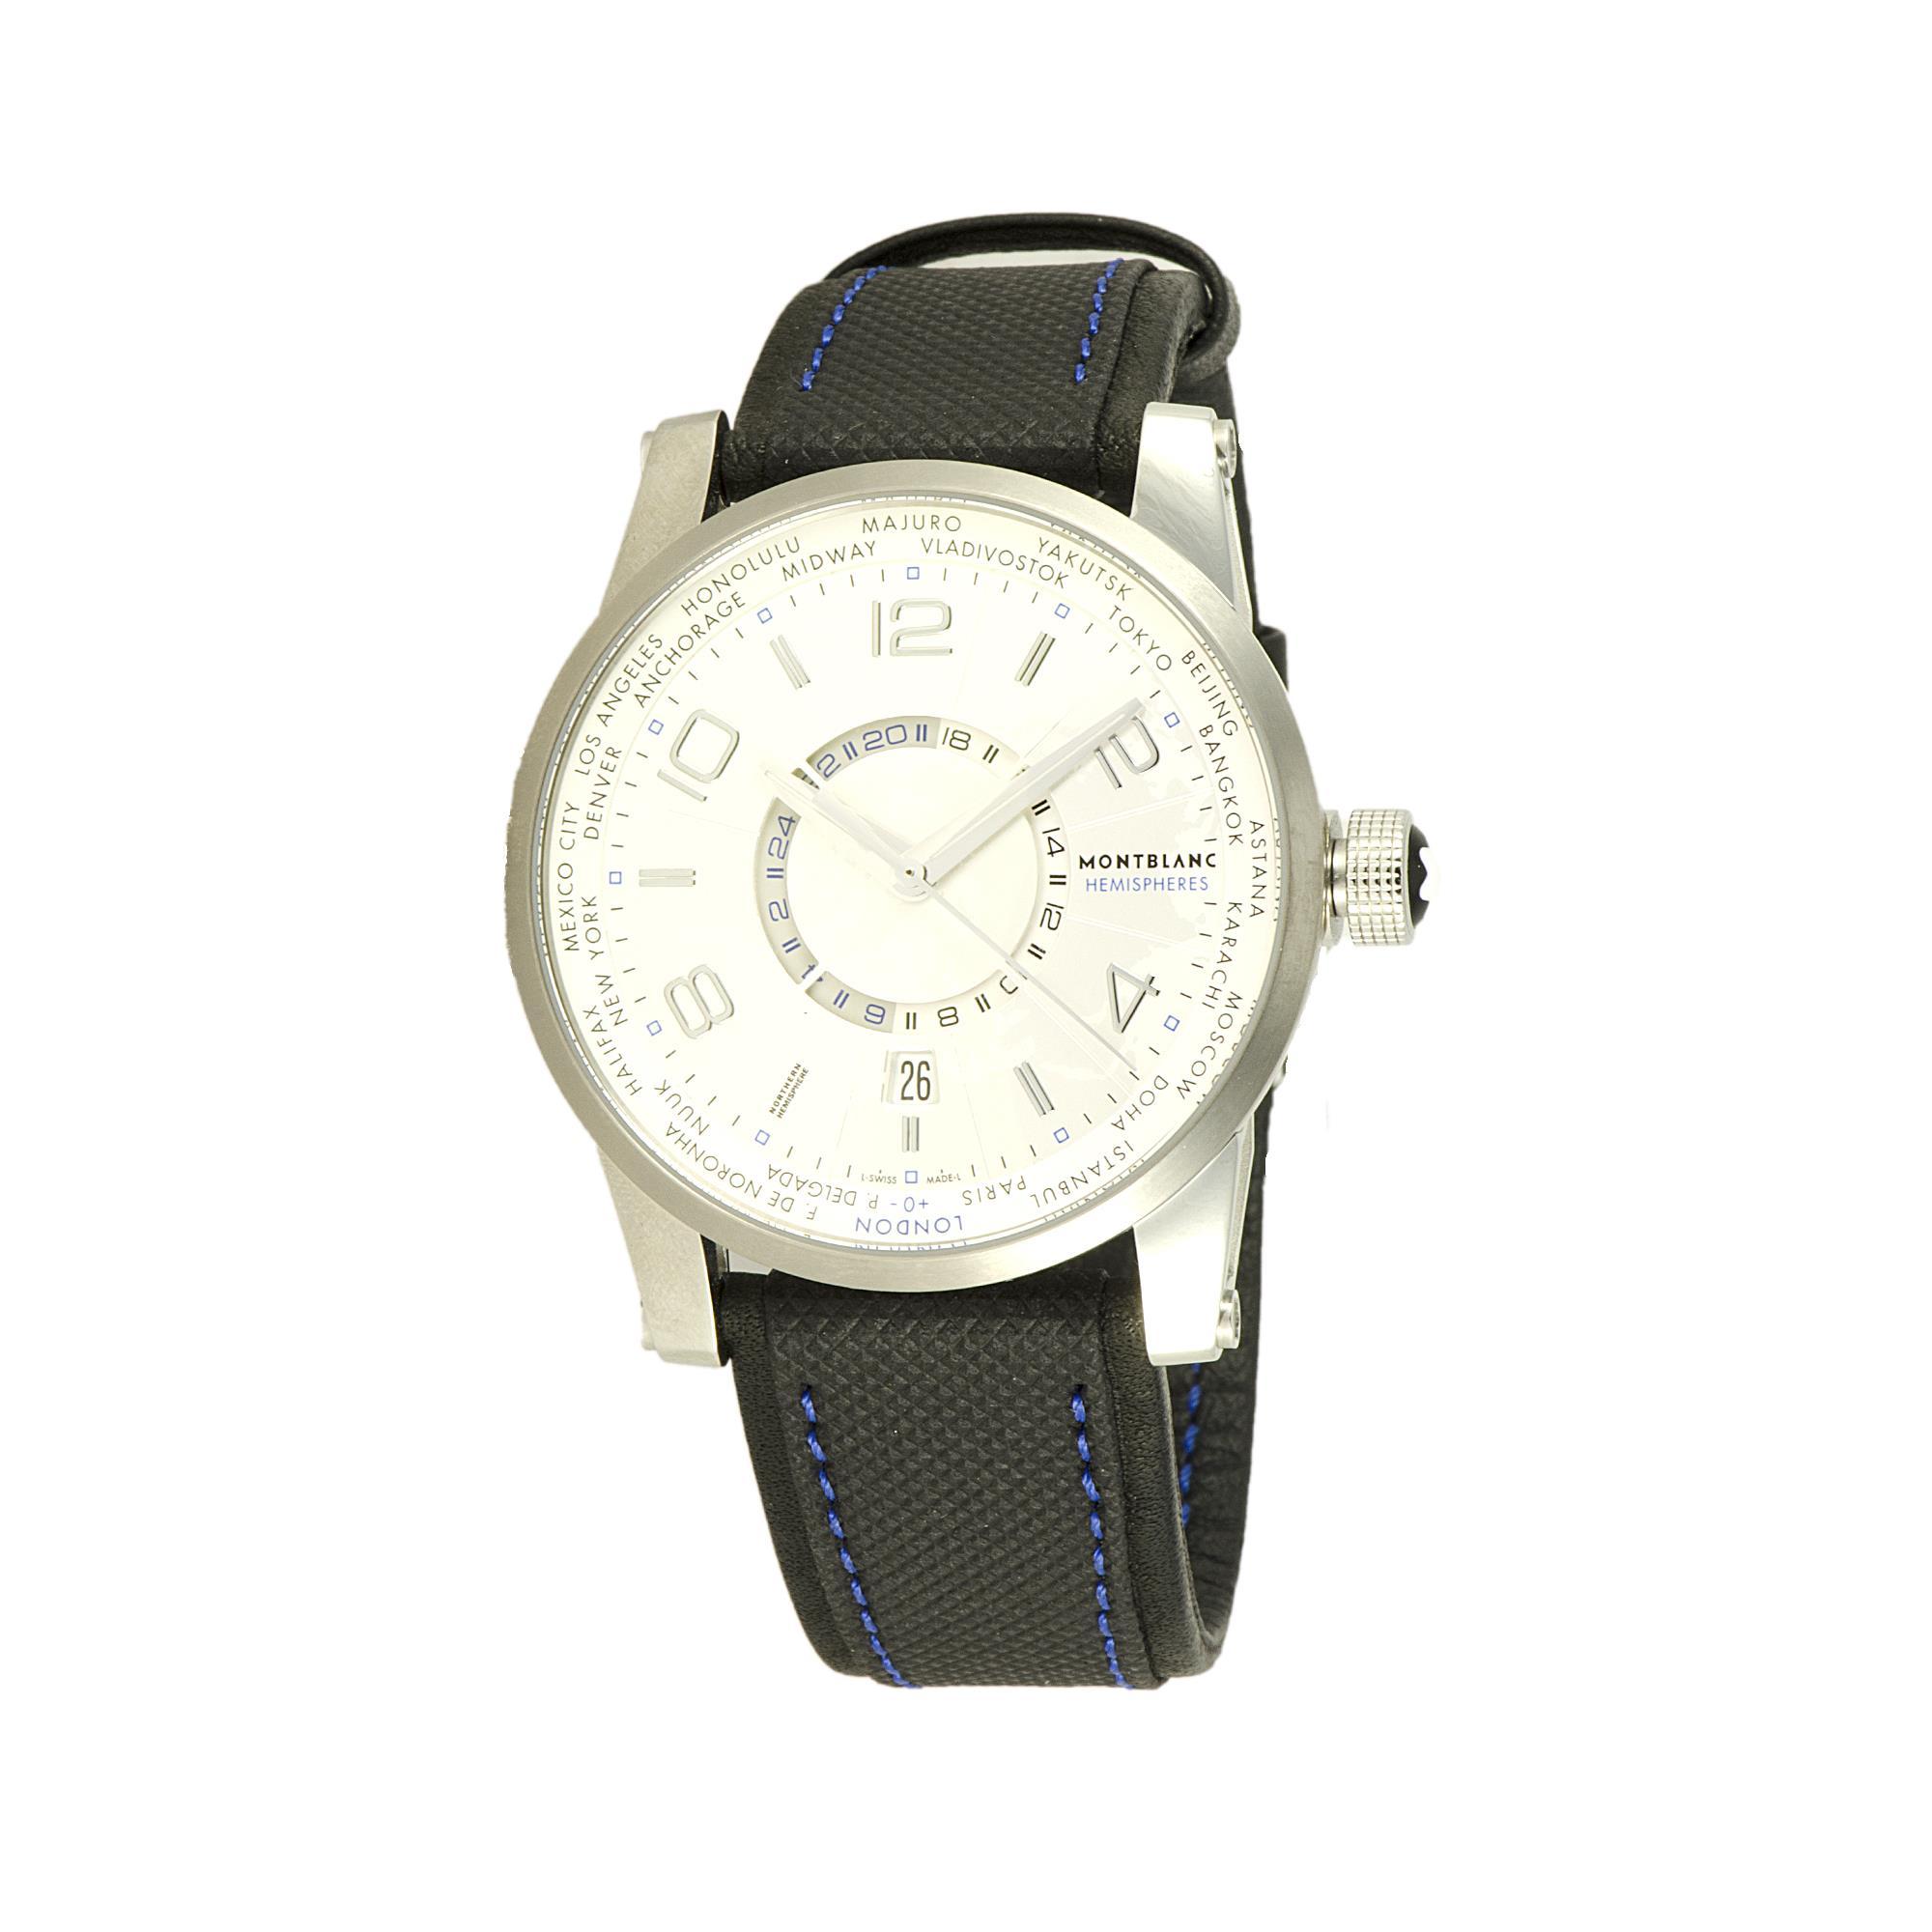 OROLOGIO MONTBLANC TIMEWALKER WORLD-TIME HEMISPHERES  - MONTBLANC